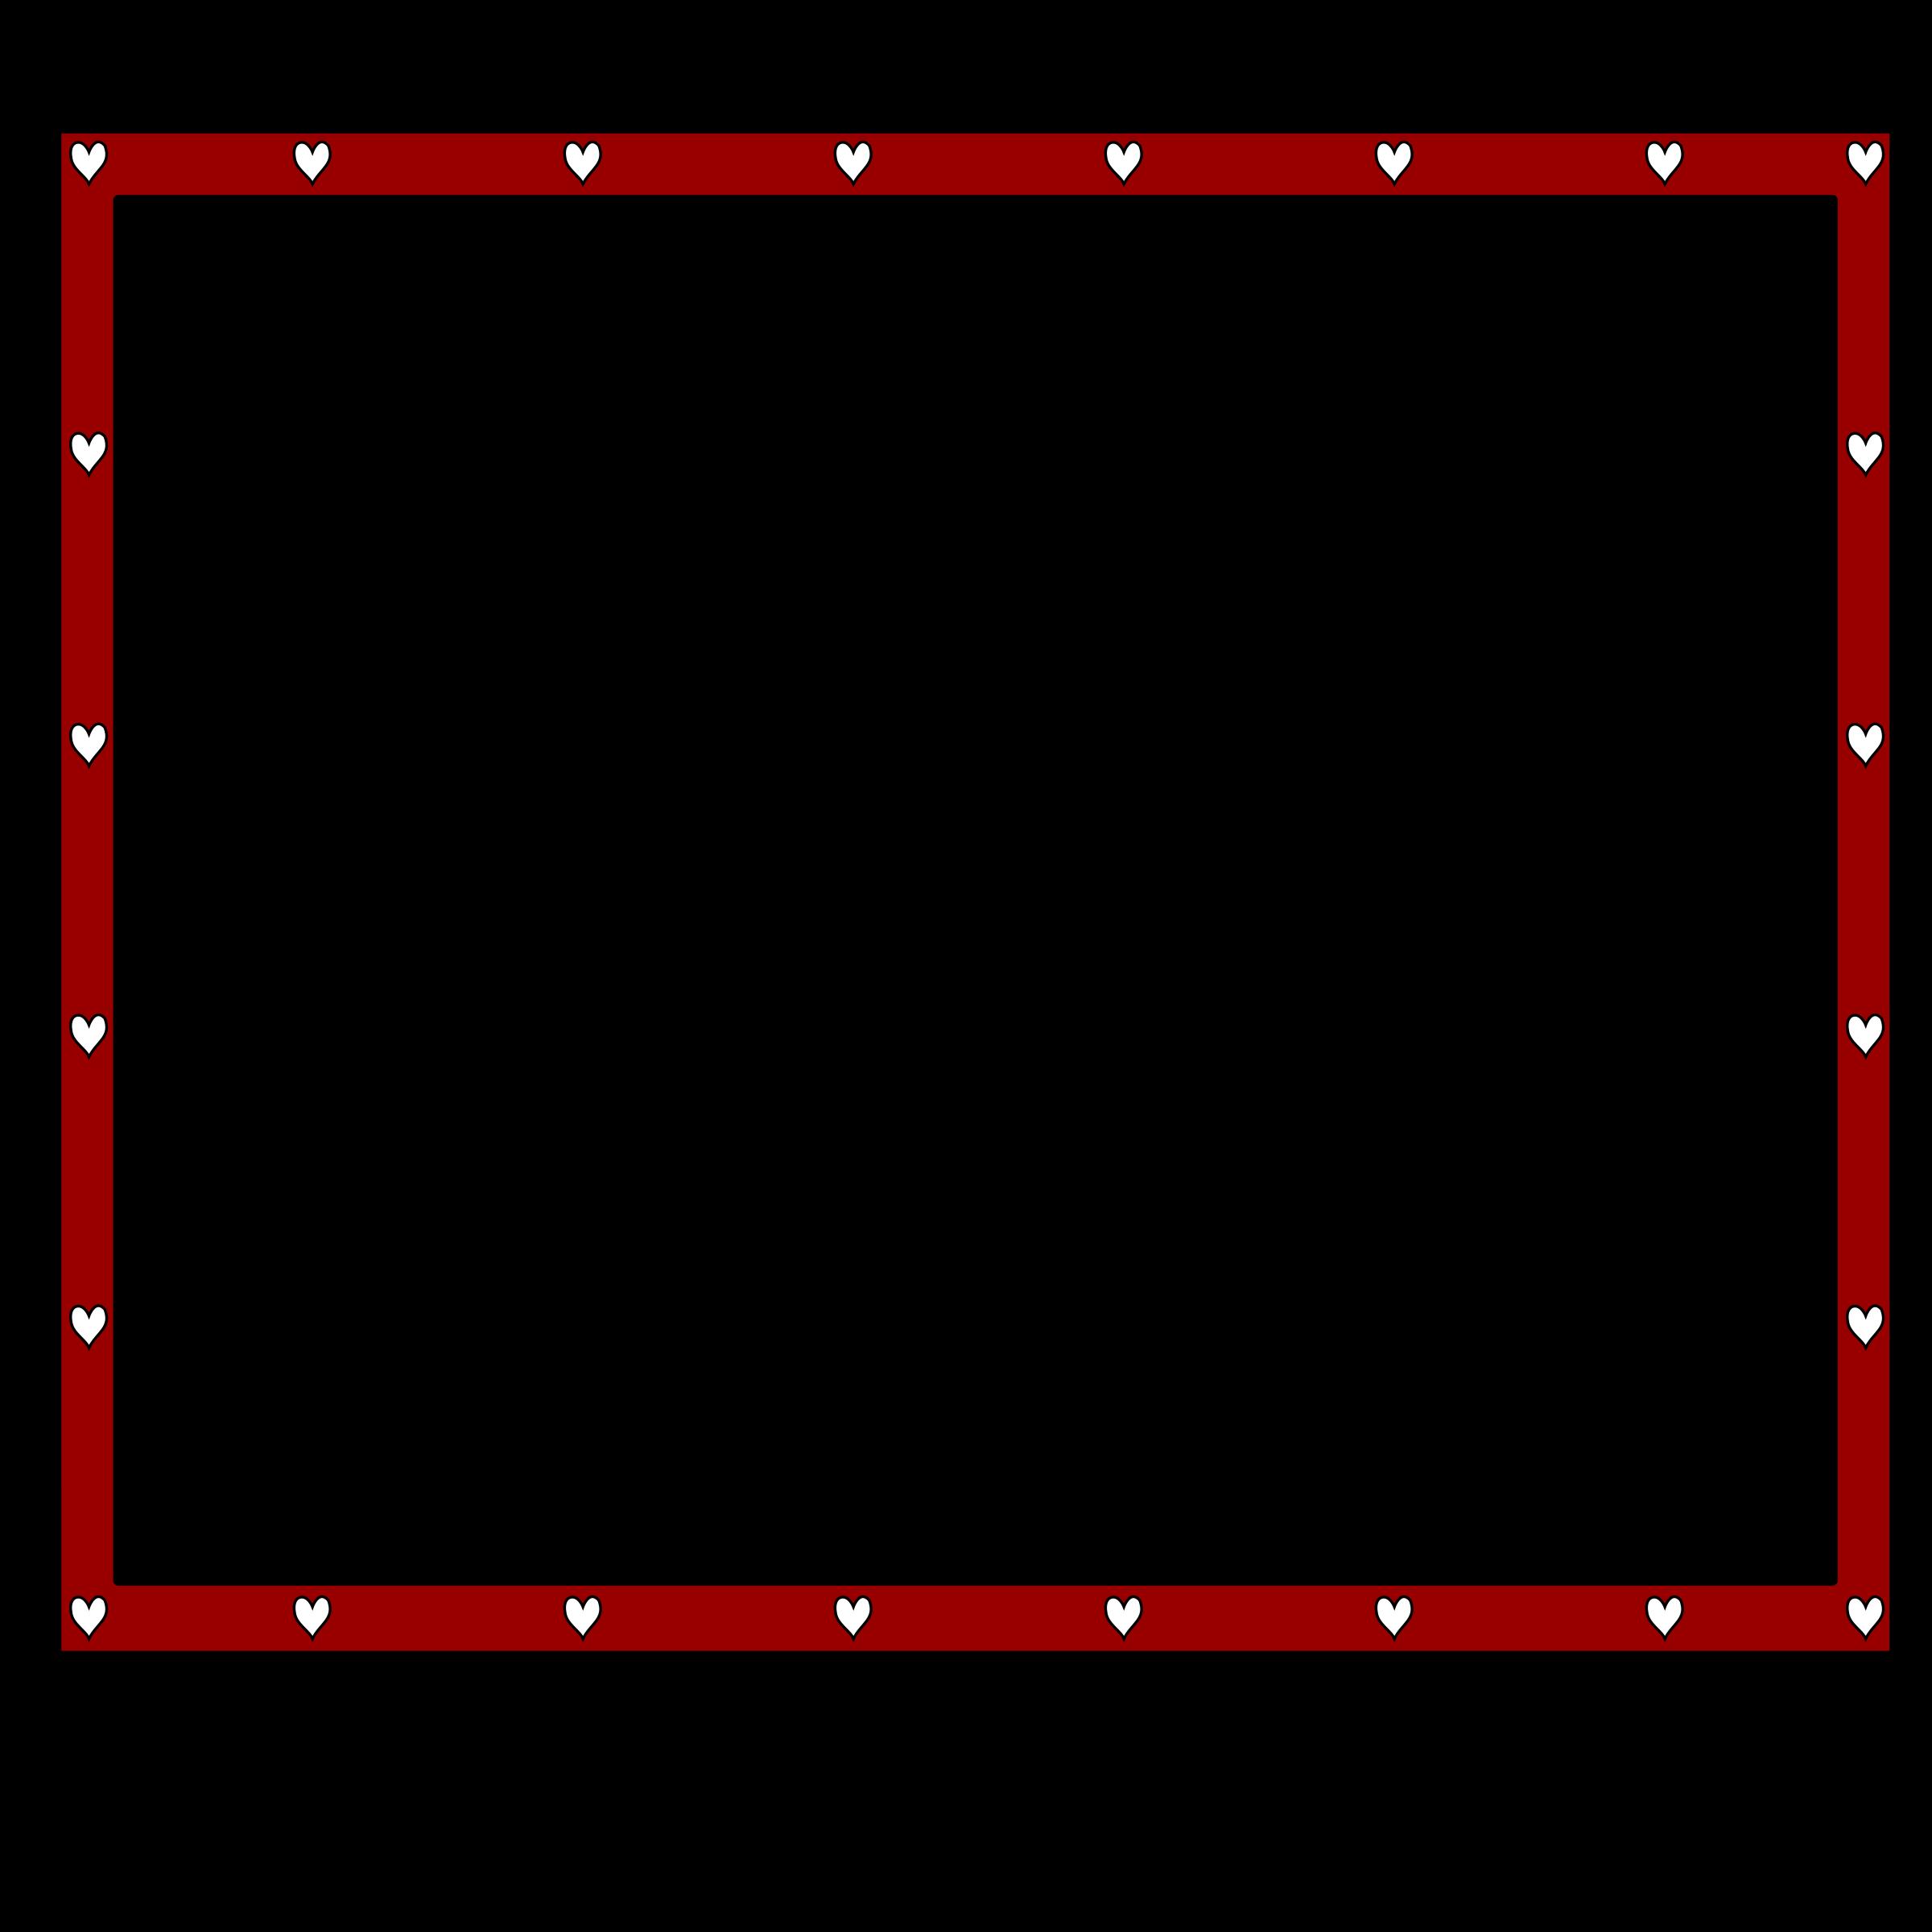 Sparkle clipart border. Redblack hearts x big